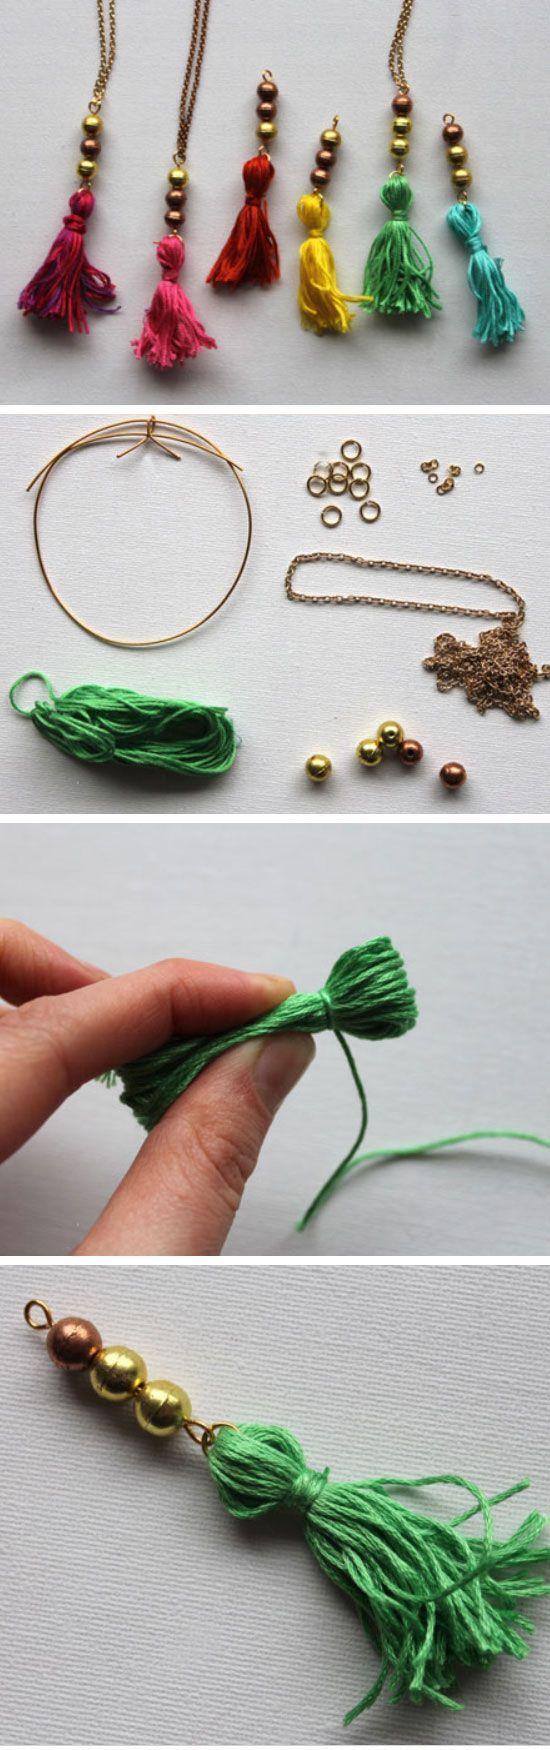 The 25+ best Handmade gifts for grandma ideas on Pinterest ...